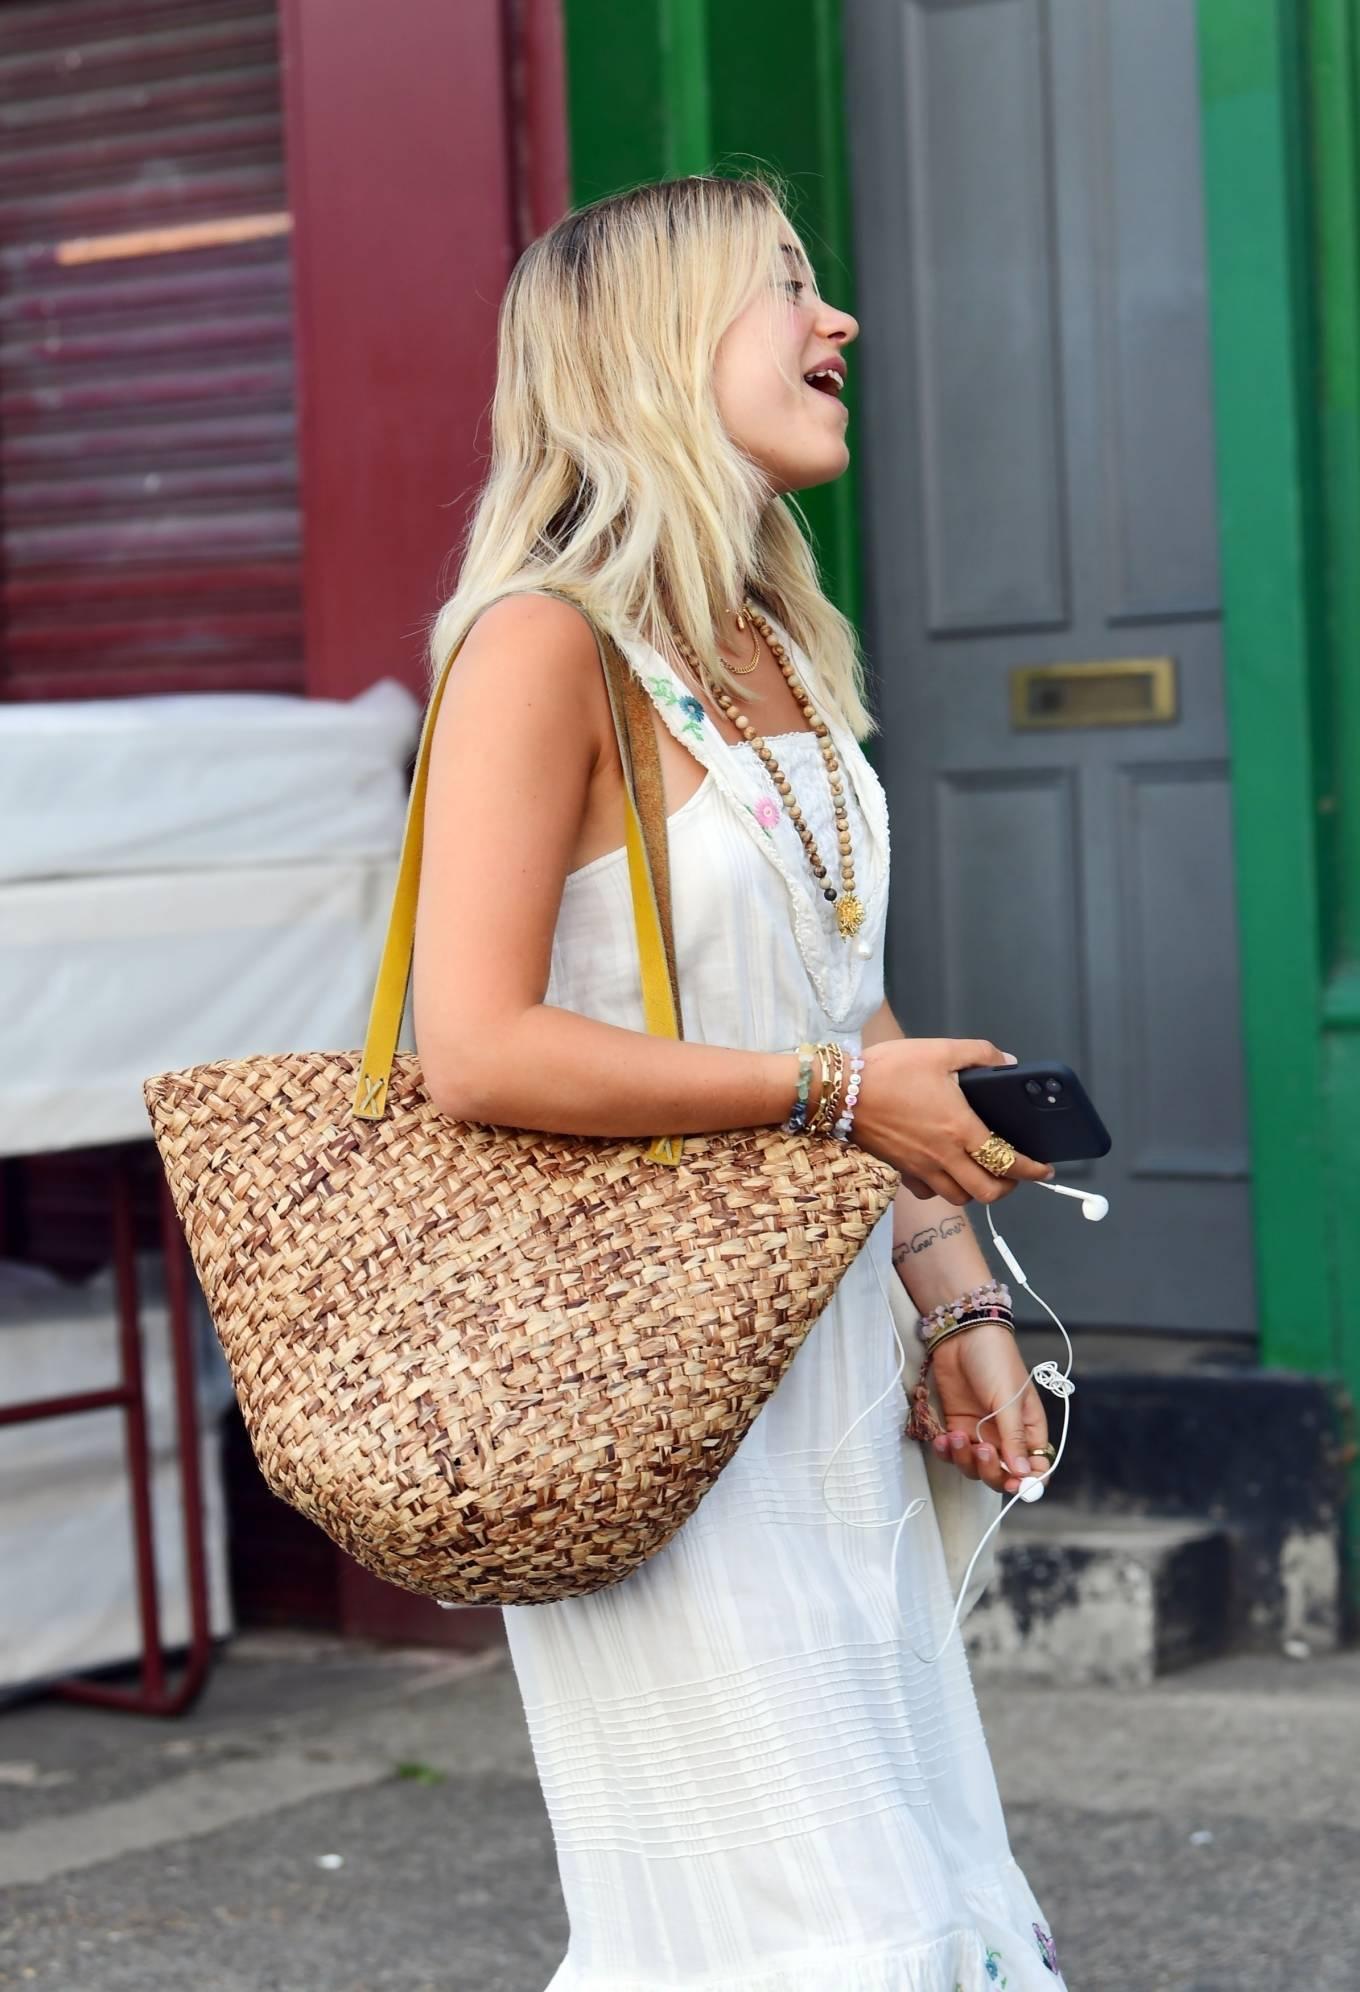 Amelia Windsor 2020 : Amelia Windsor – Looks stunning in a white summery dress in London-21